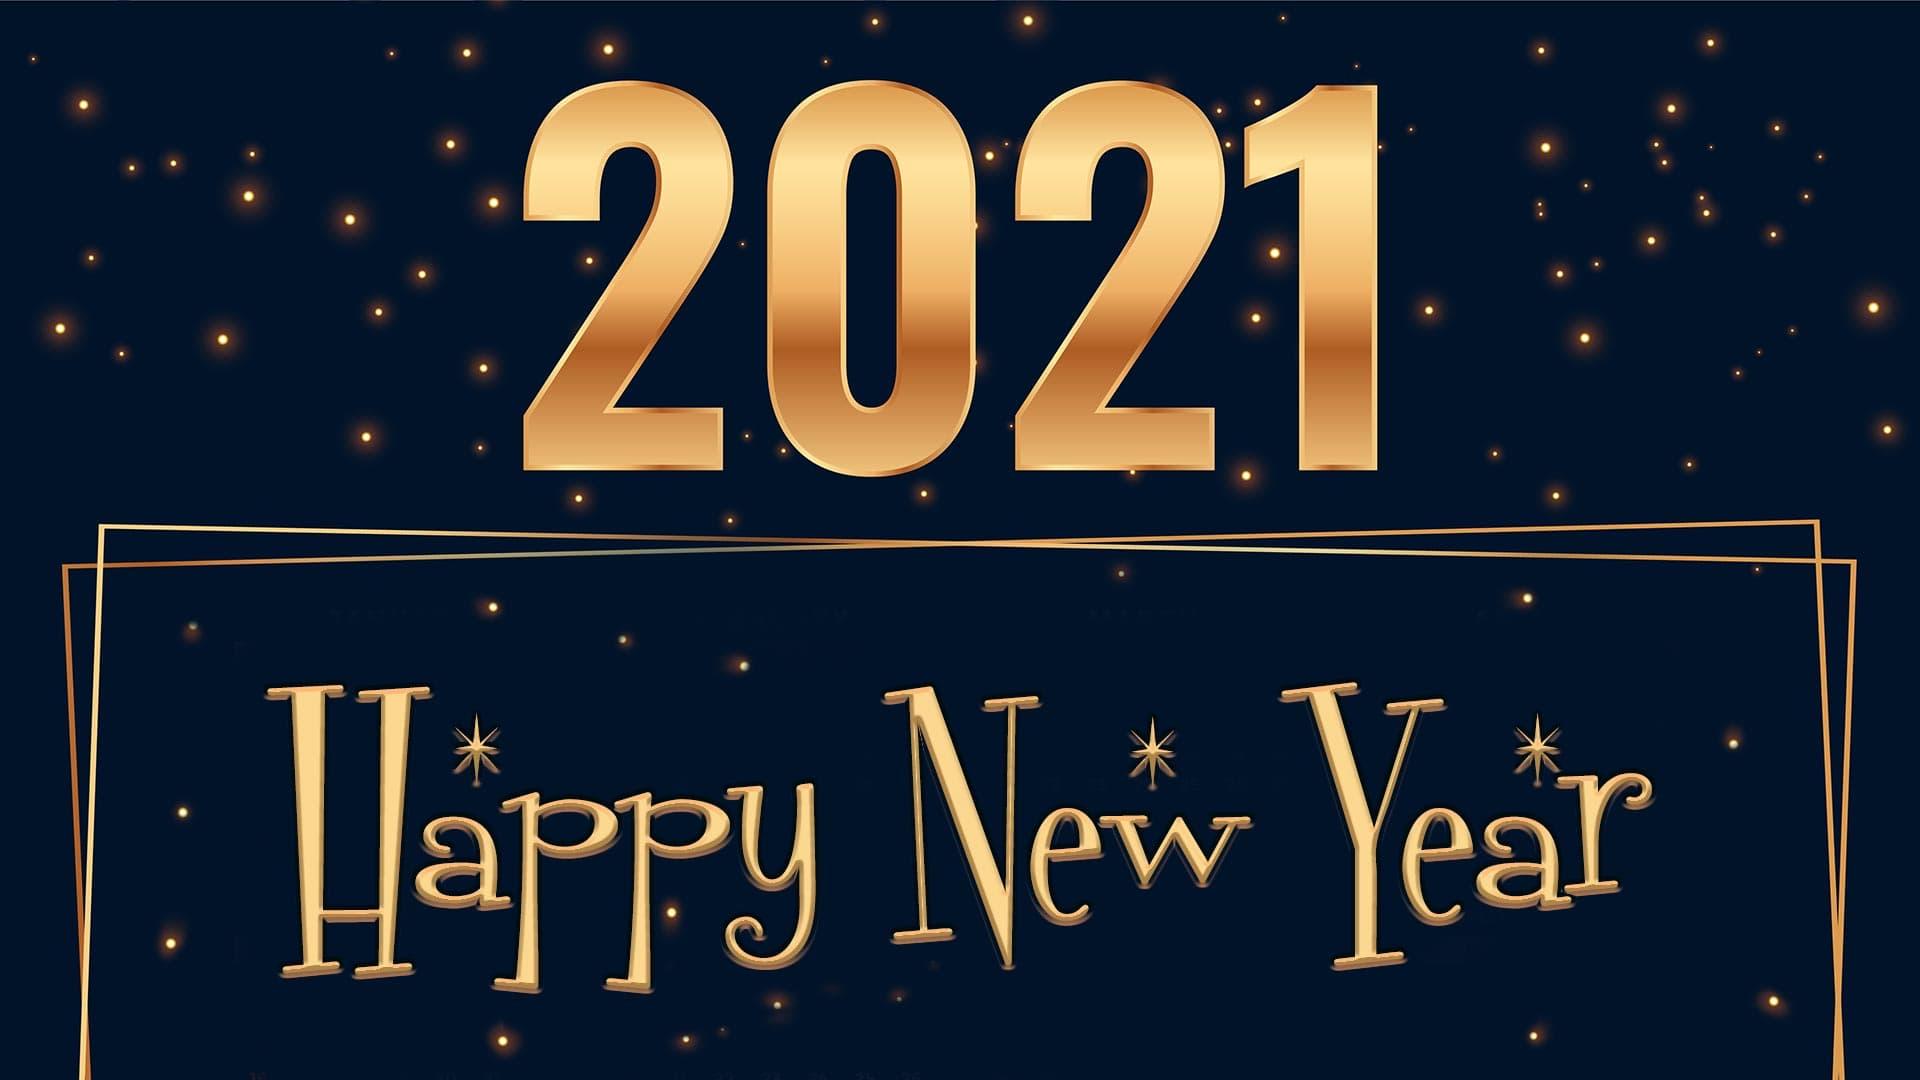 2021 Wallpaper - HD Wallpaper 2021 Free Download